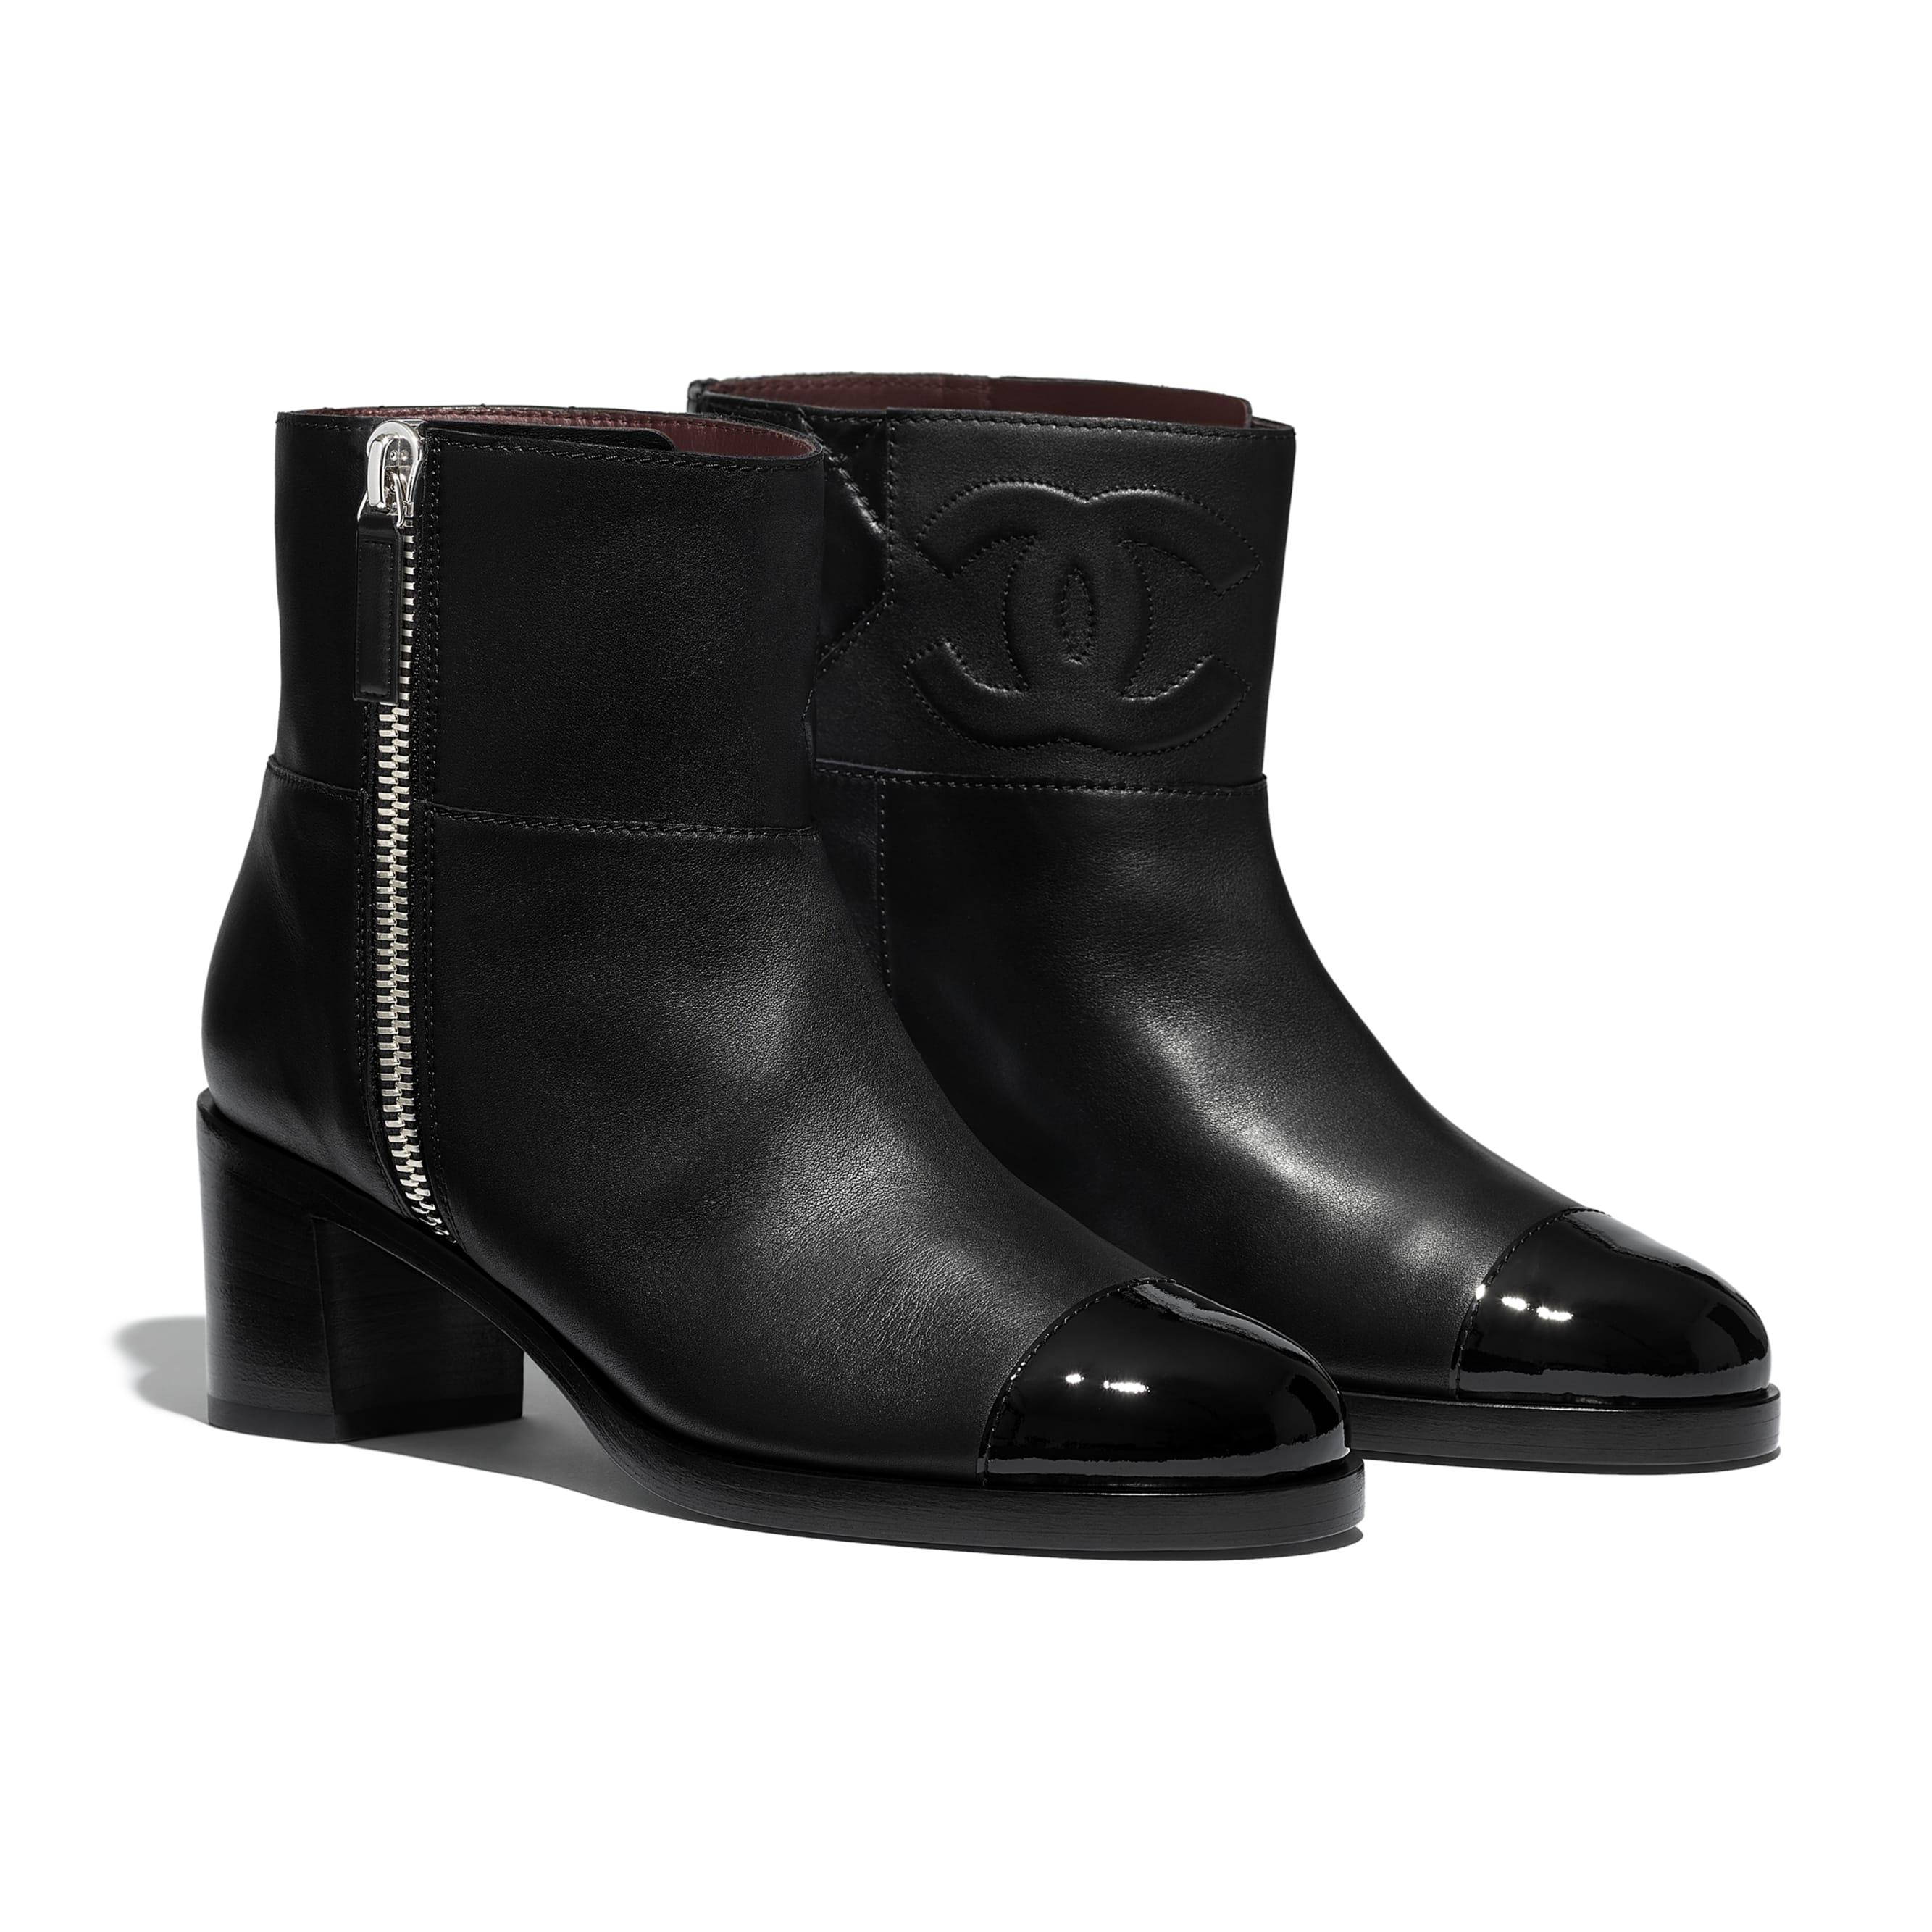 Ankle Boots - Black - Calfskin & Patent Calfskin - Alternative view - see standard sized version